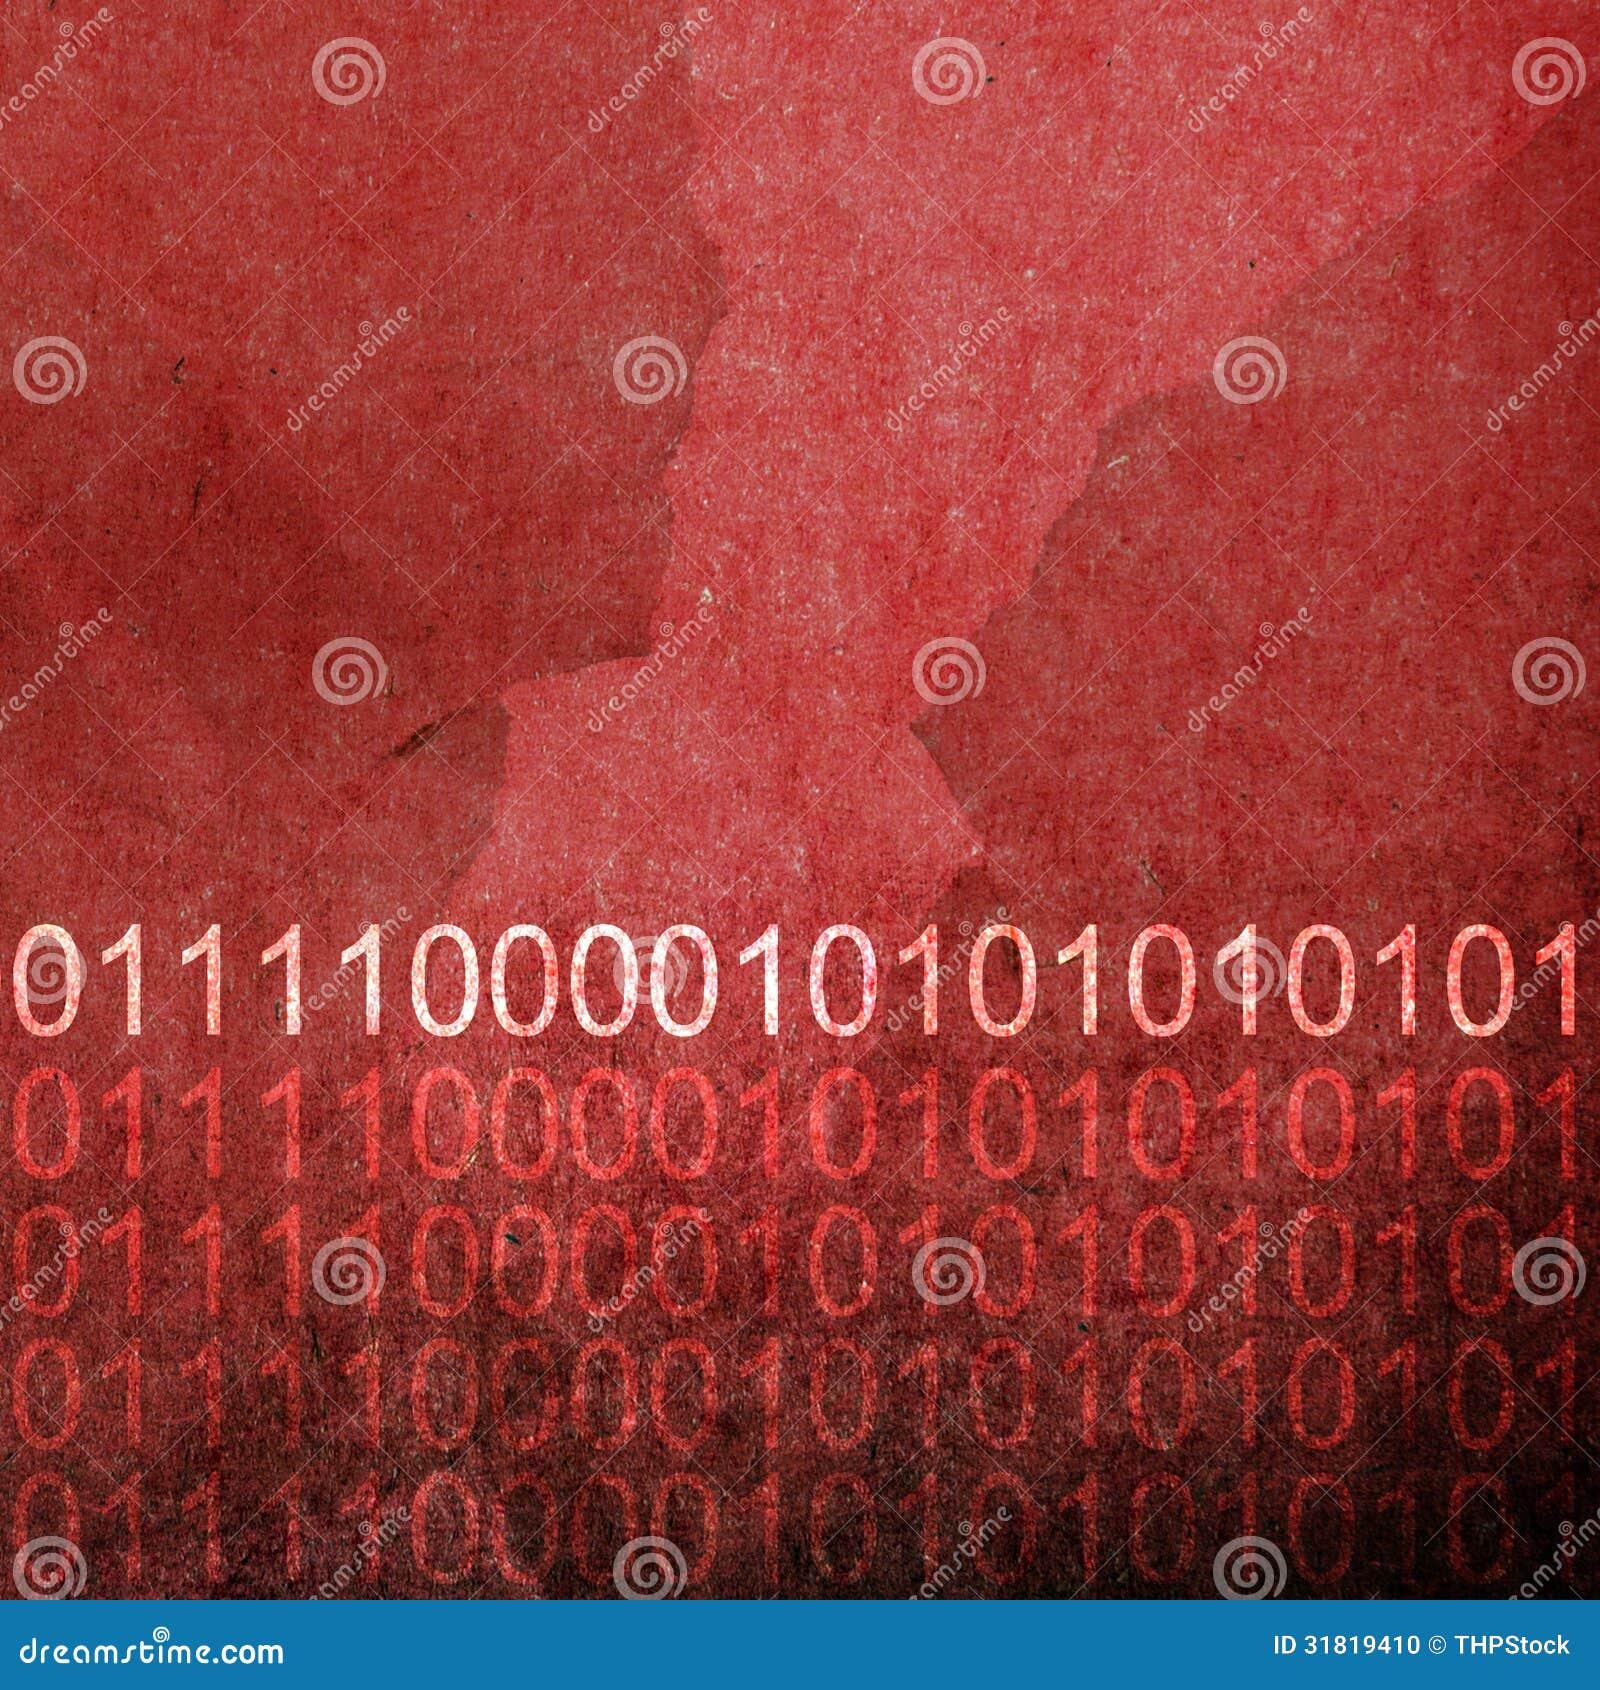 Grunge Red Binary Code Background Stock Photo - Image ...